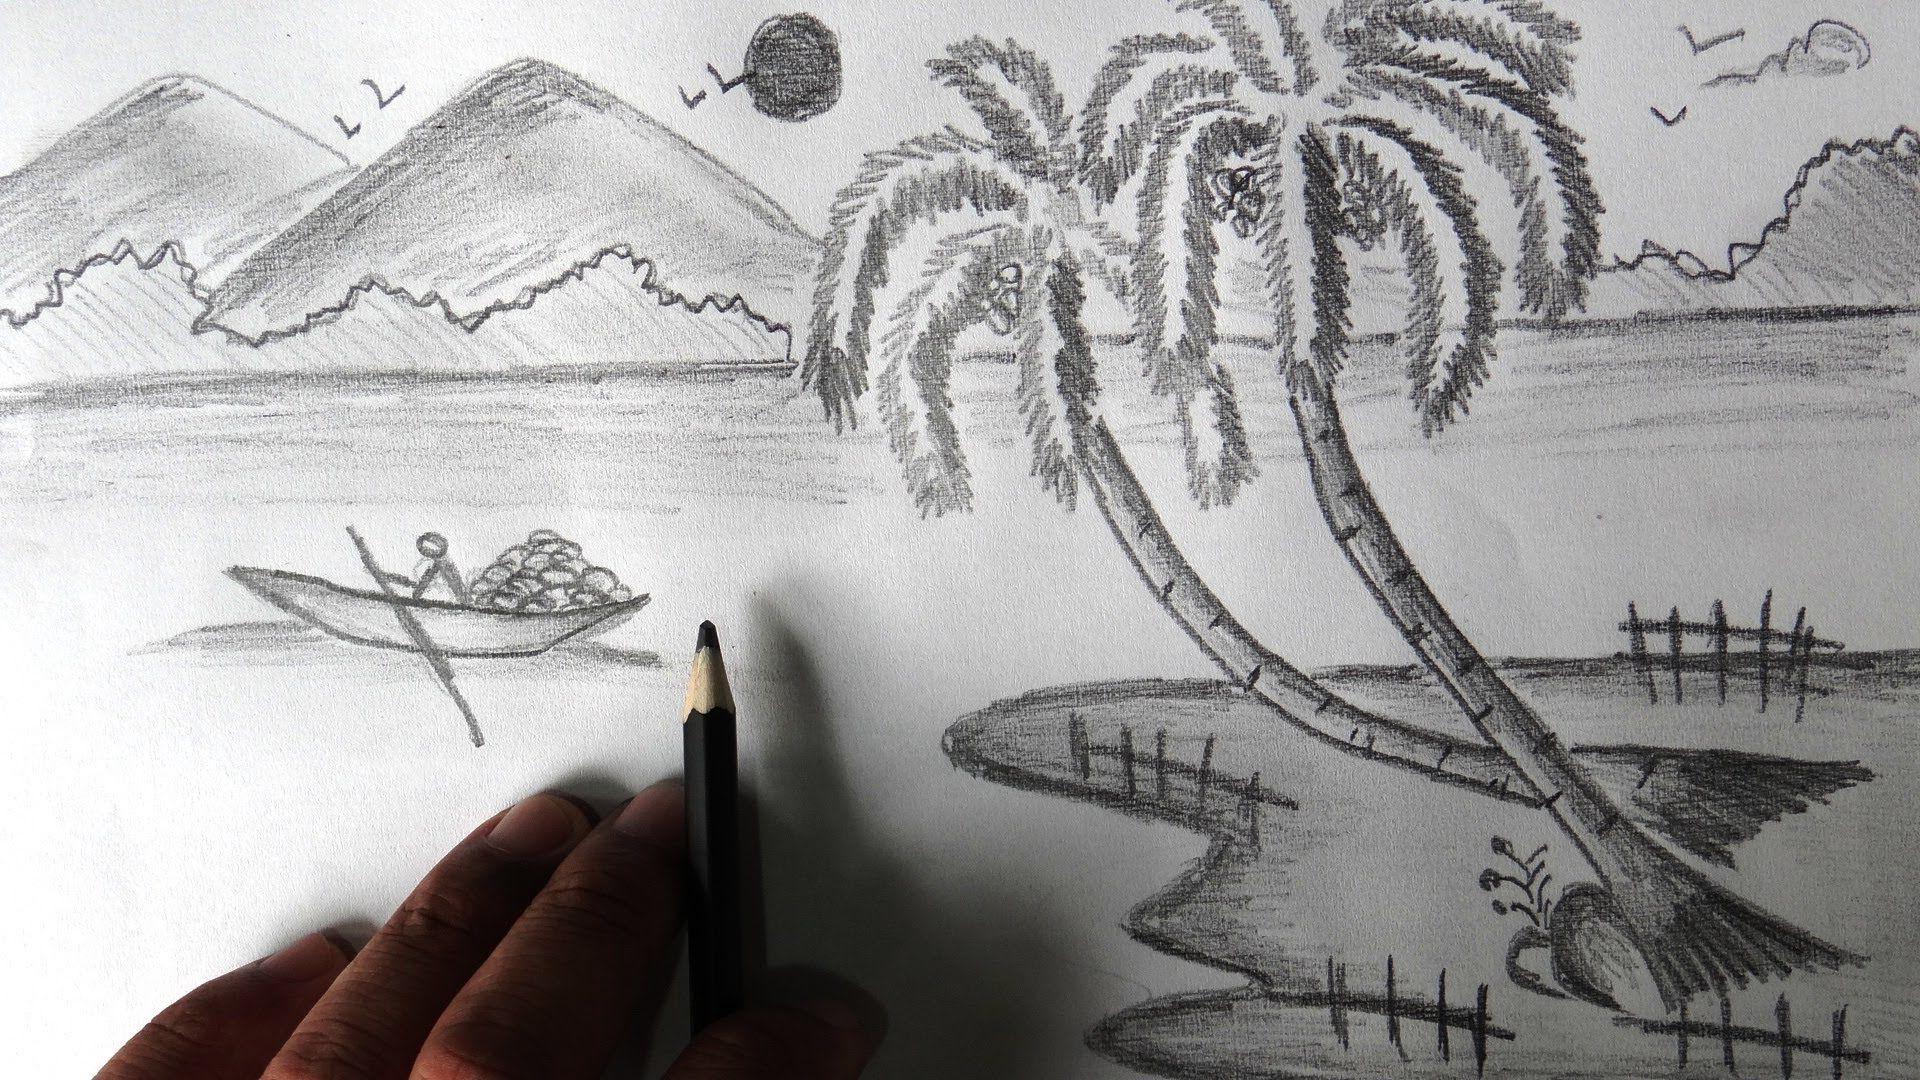 Beautiful nature pencil sketch 1920x1080